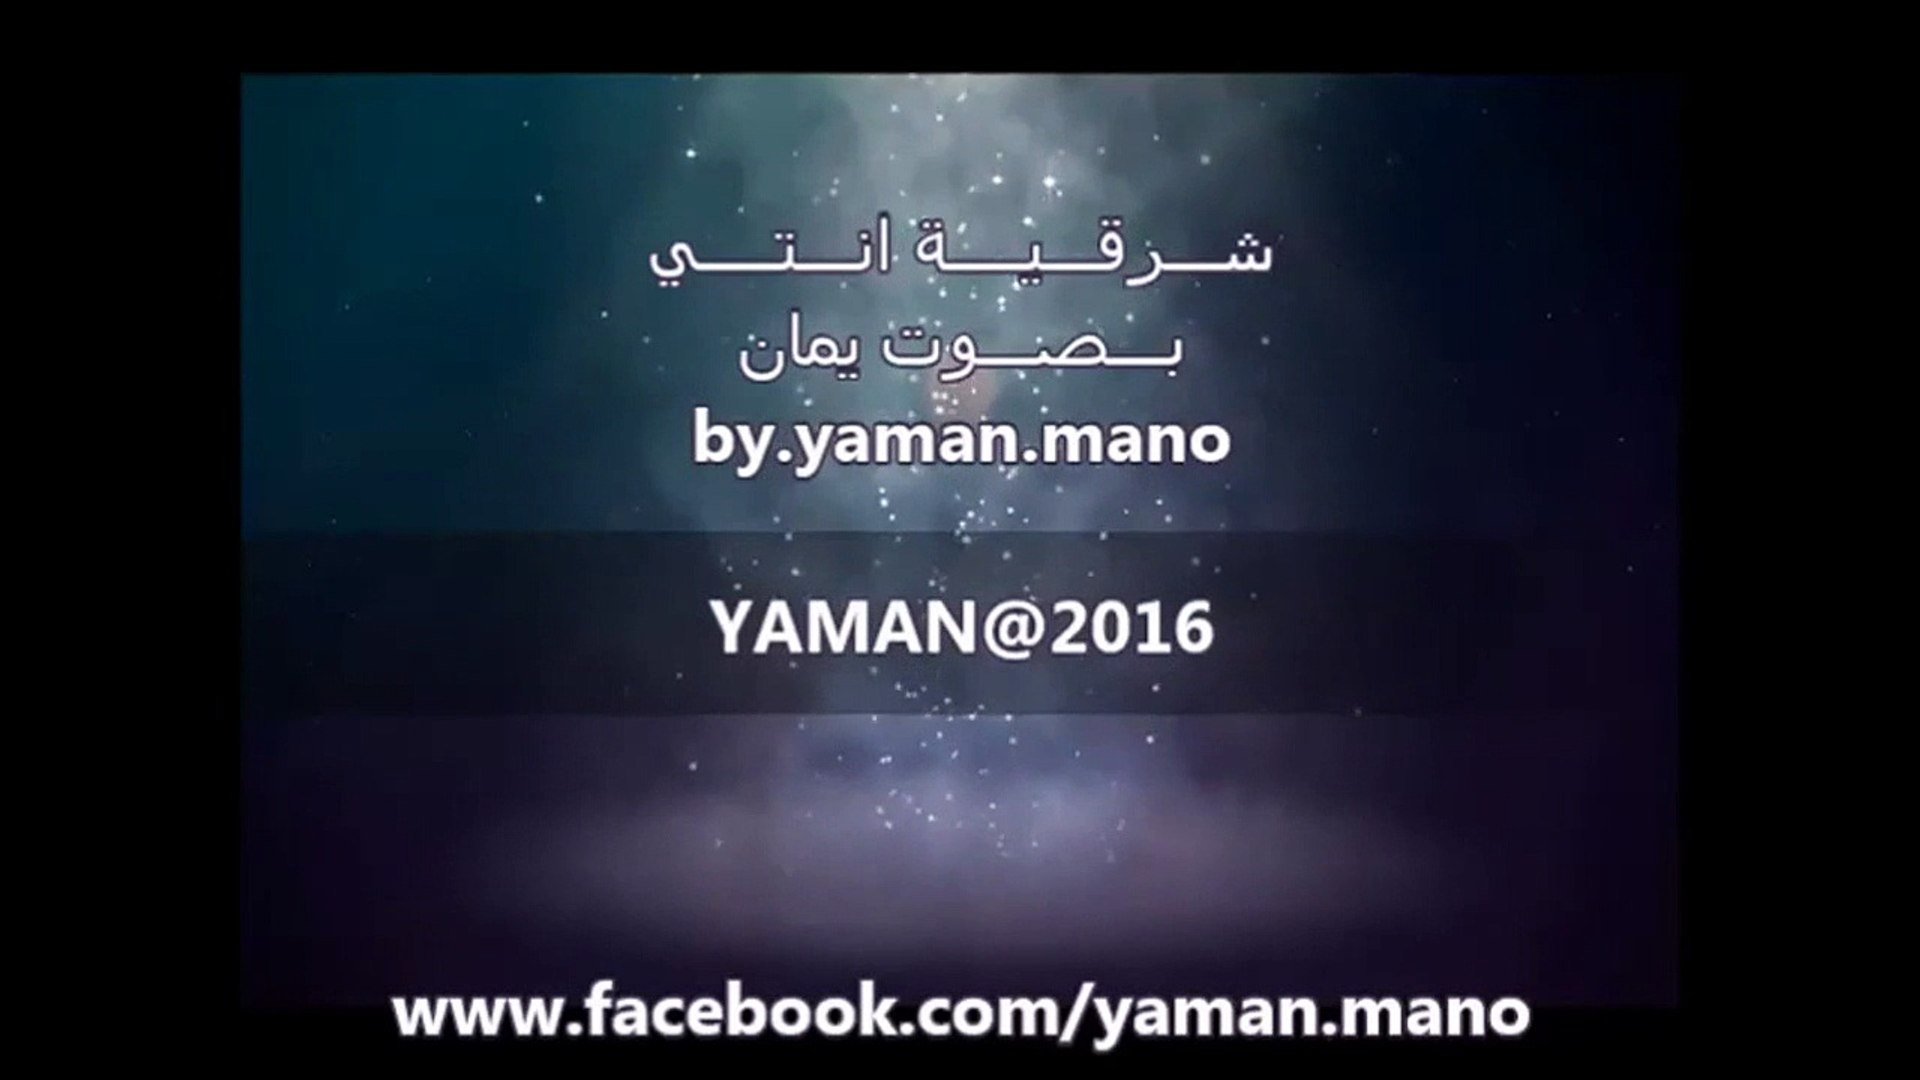 2016  شرقية انتي  بصوت يمان by yaman mano - YouTube